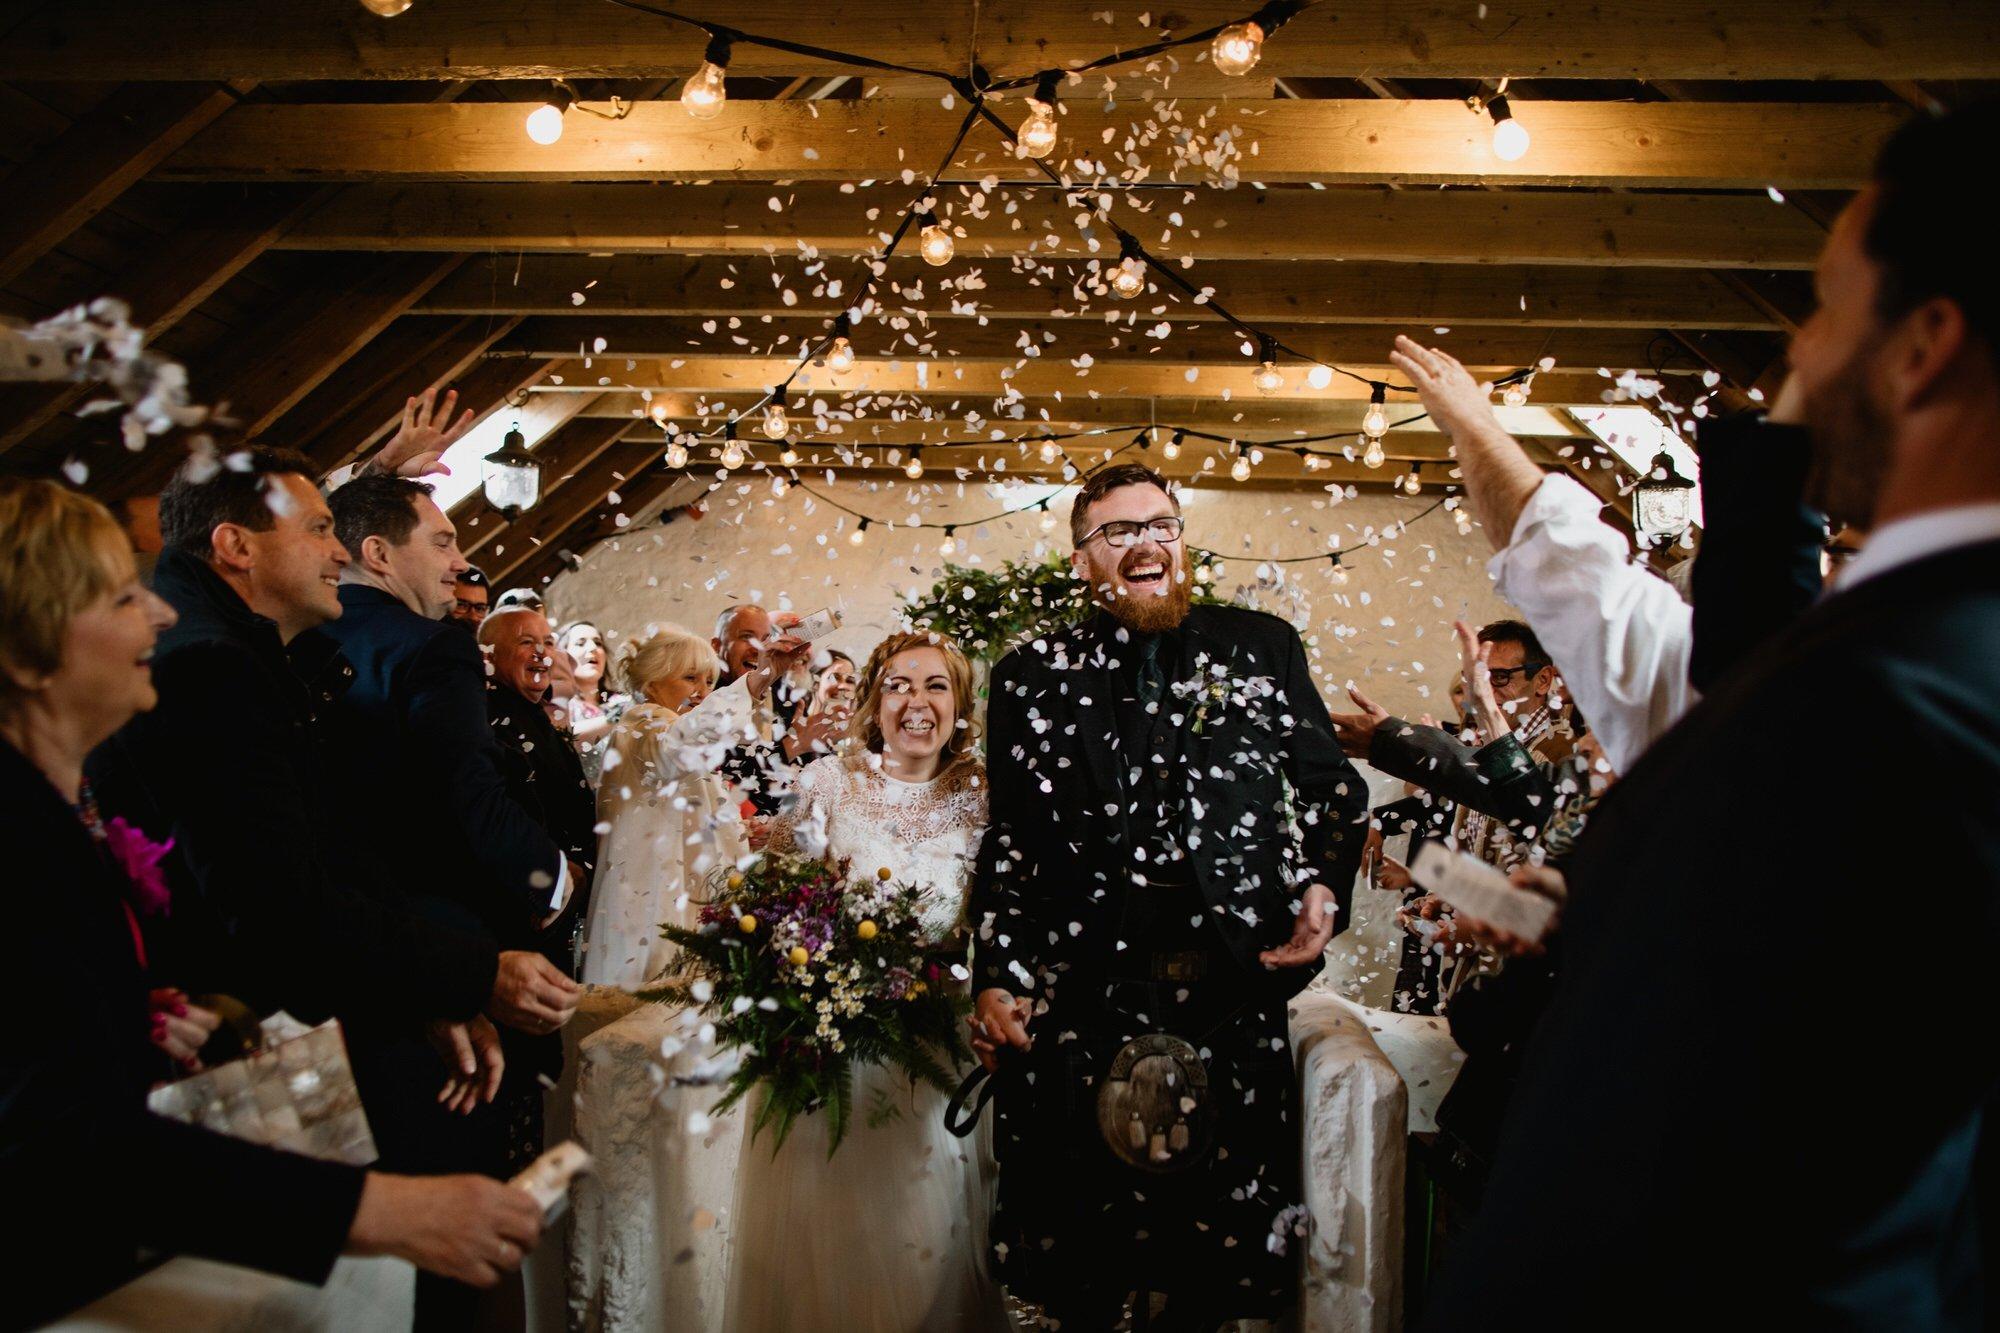 028 TIN SHED KNOCKRAICH WEDDING AUSTRIAN SCOTTISH ZOE ALEXANDRA PHOTOGRAPHY